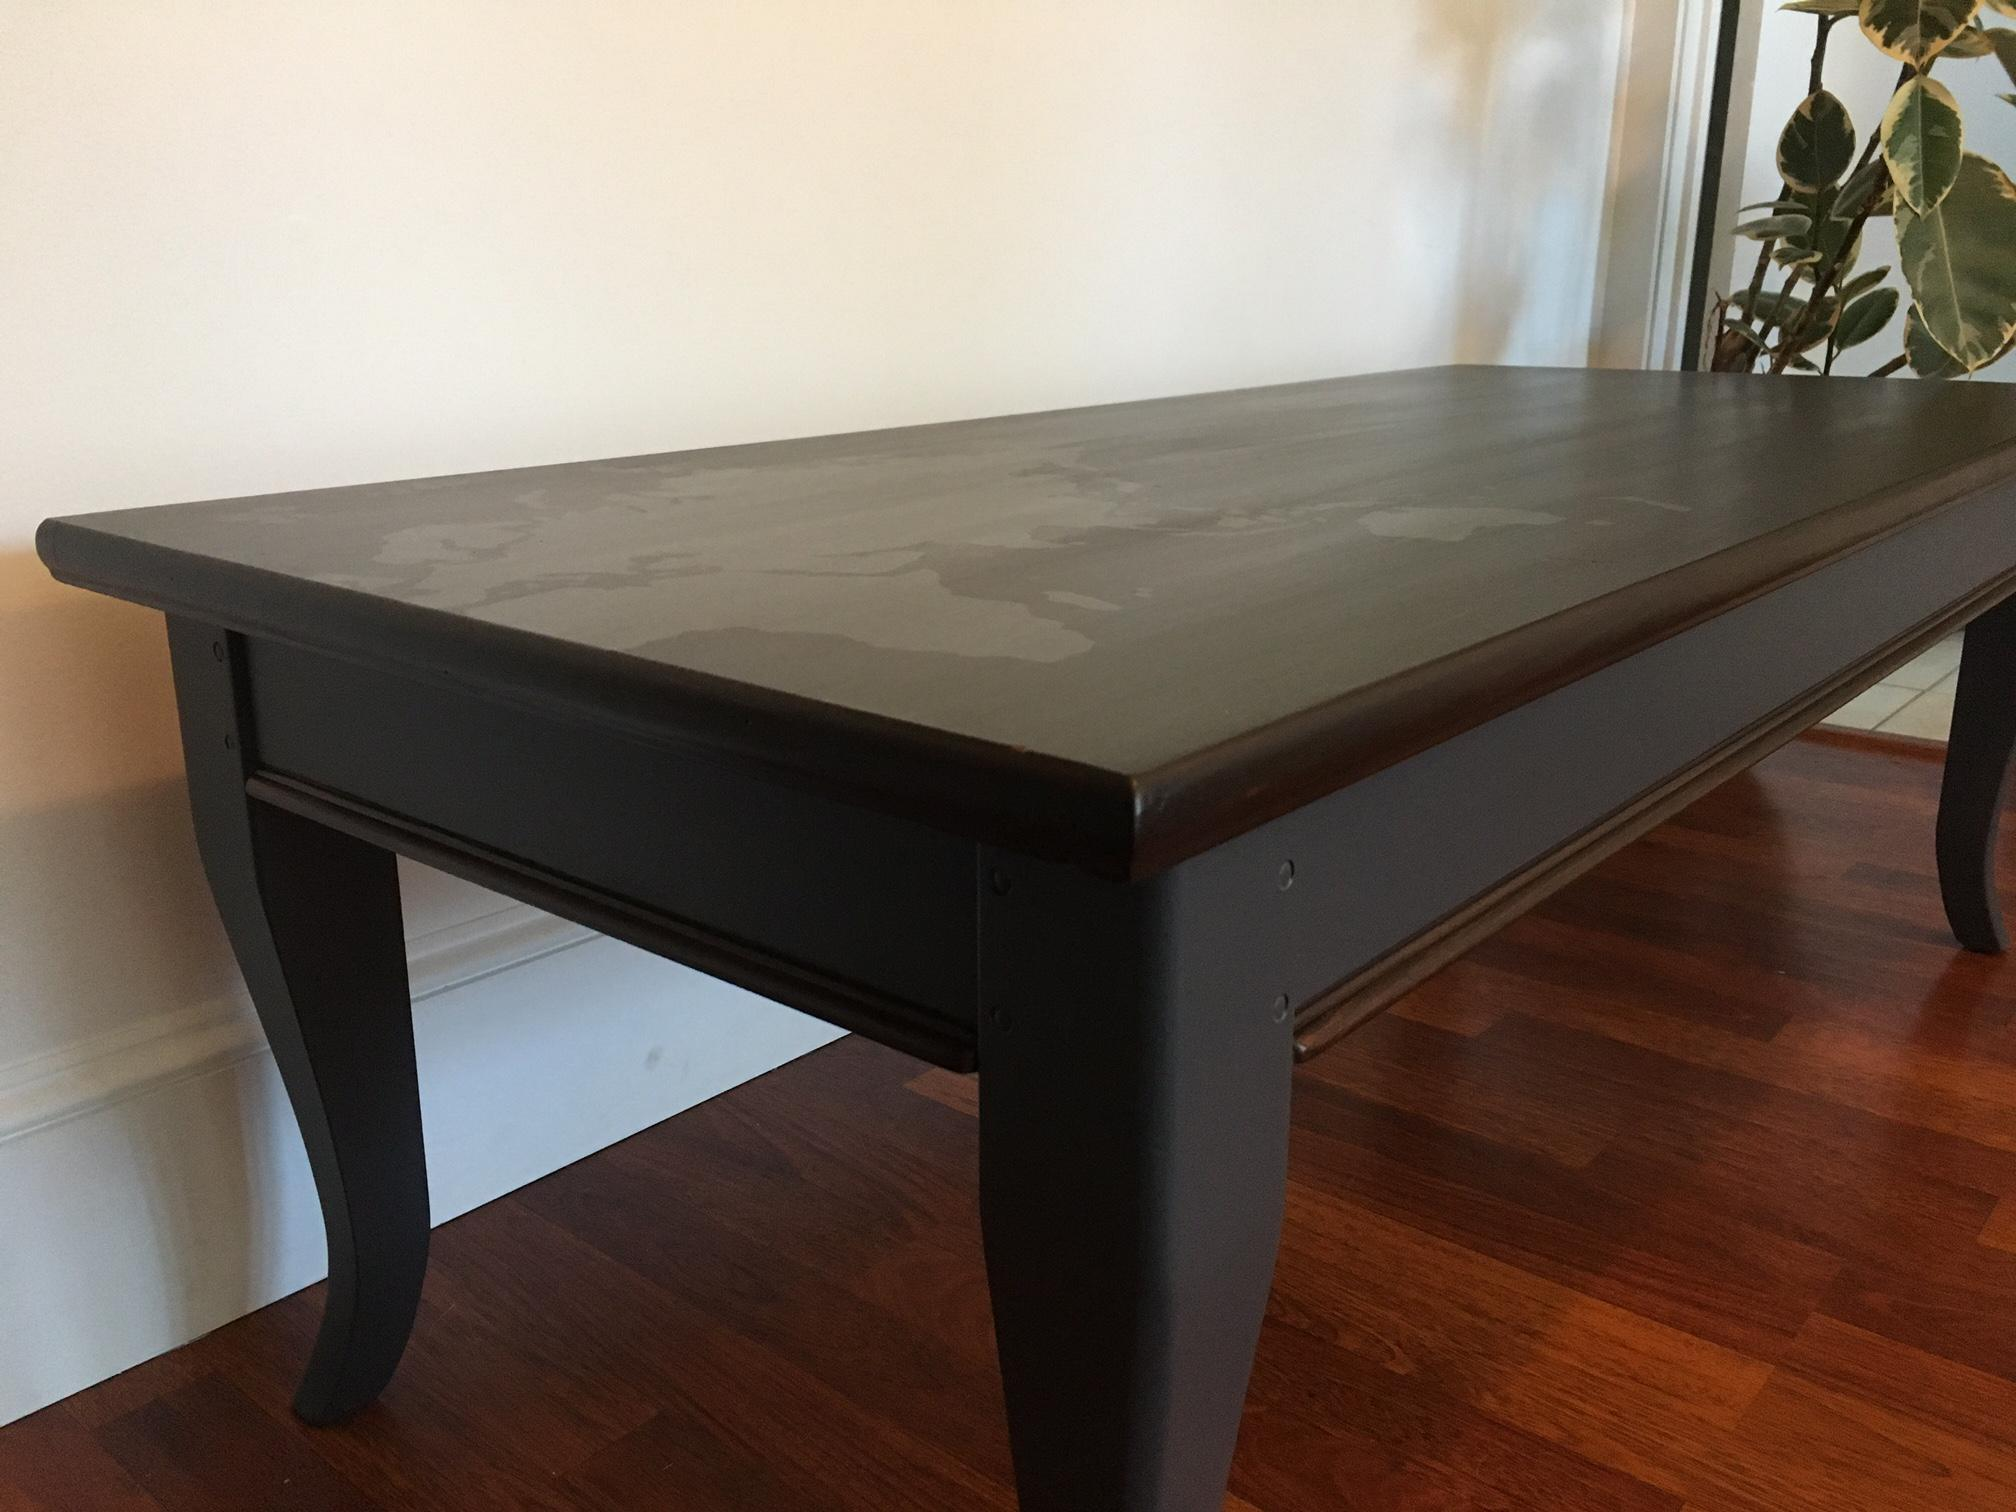 World Map Coffee u0026 Side Table Set - Image 6 of 11  sc 1 st  Chairish & World Map Coffee u0026 Side Table Set | Chairish